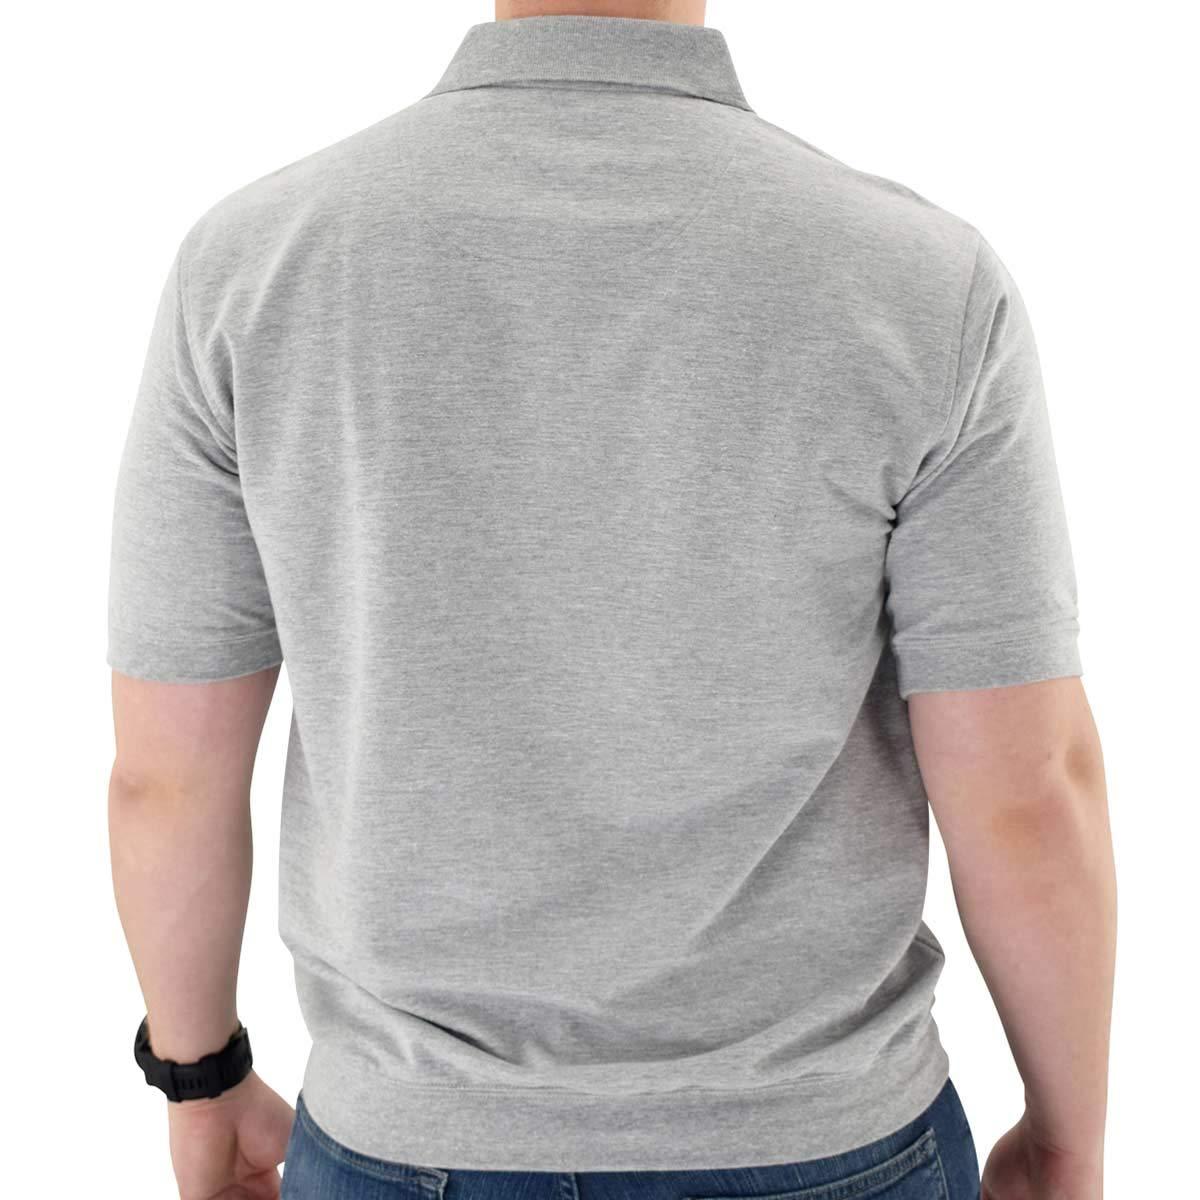 Classics by Palmland Short Sleeve Banded Bottom Shirt Big and Tall Grey HTH